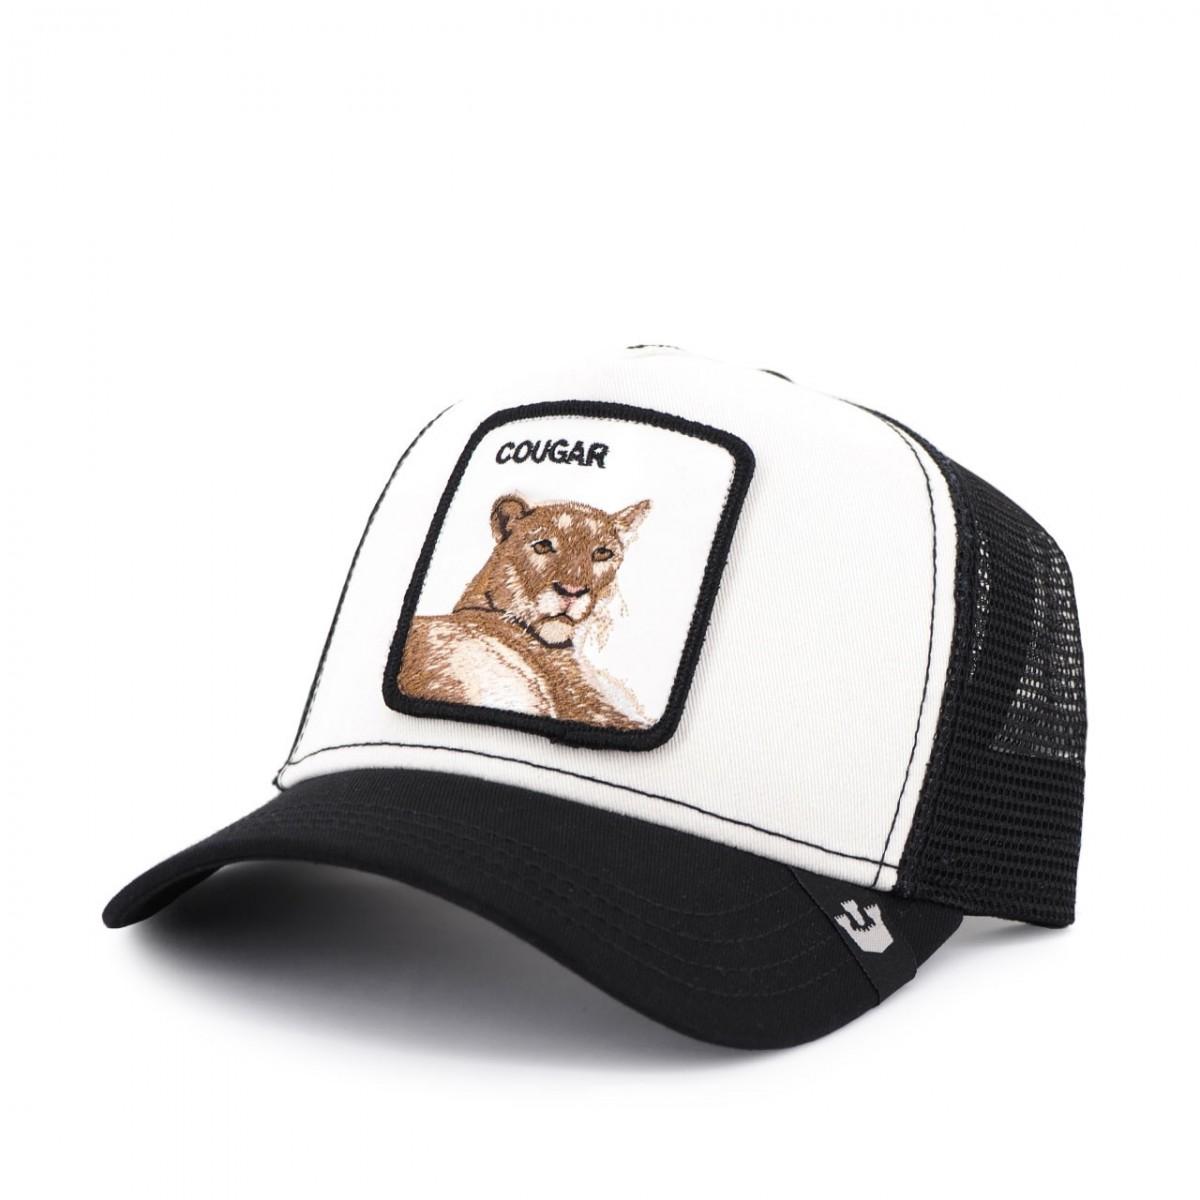 8ab892b9a2bc41 Goorin Bros. | Cougar Baseball Hat Black | GOB_101-0570-BLK